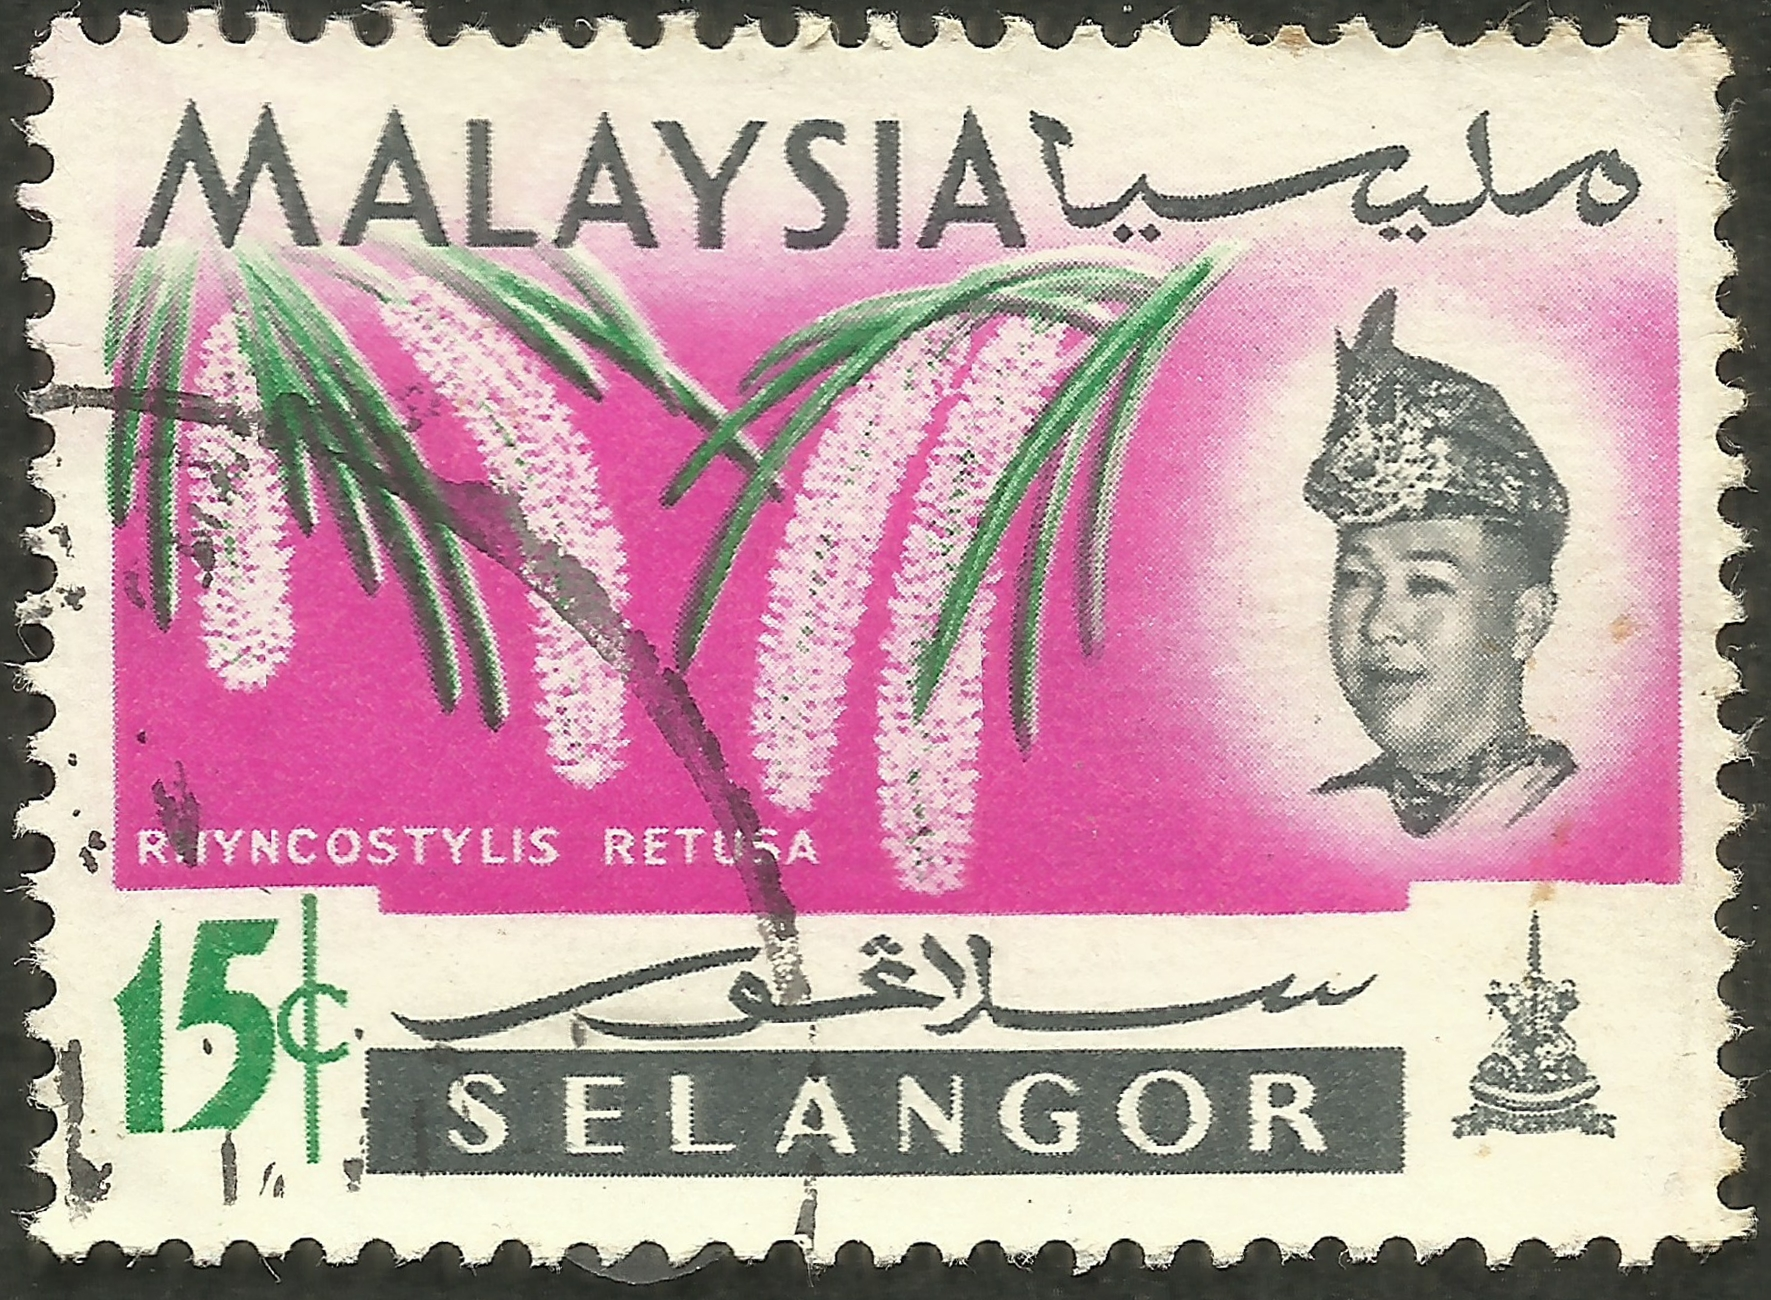 Selangor [Malaysian State] #126 (1965)